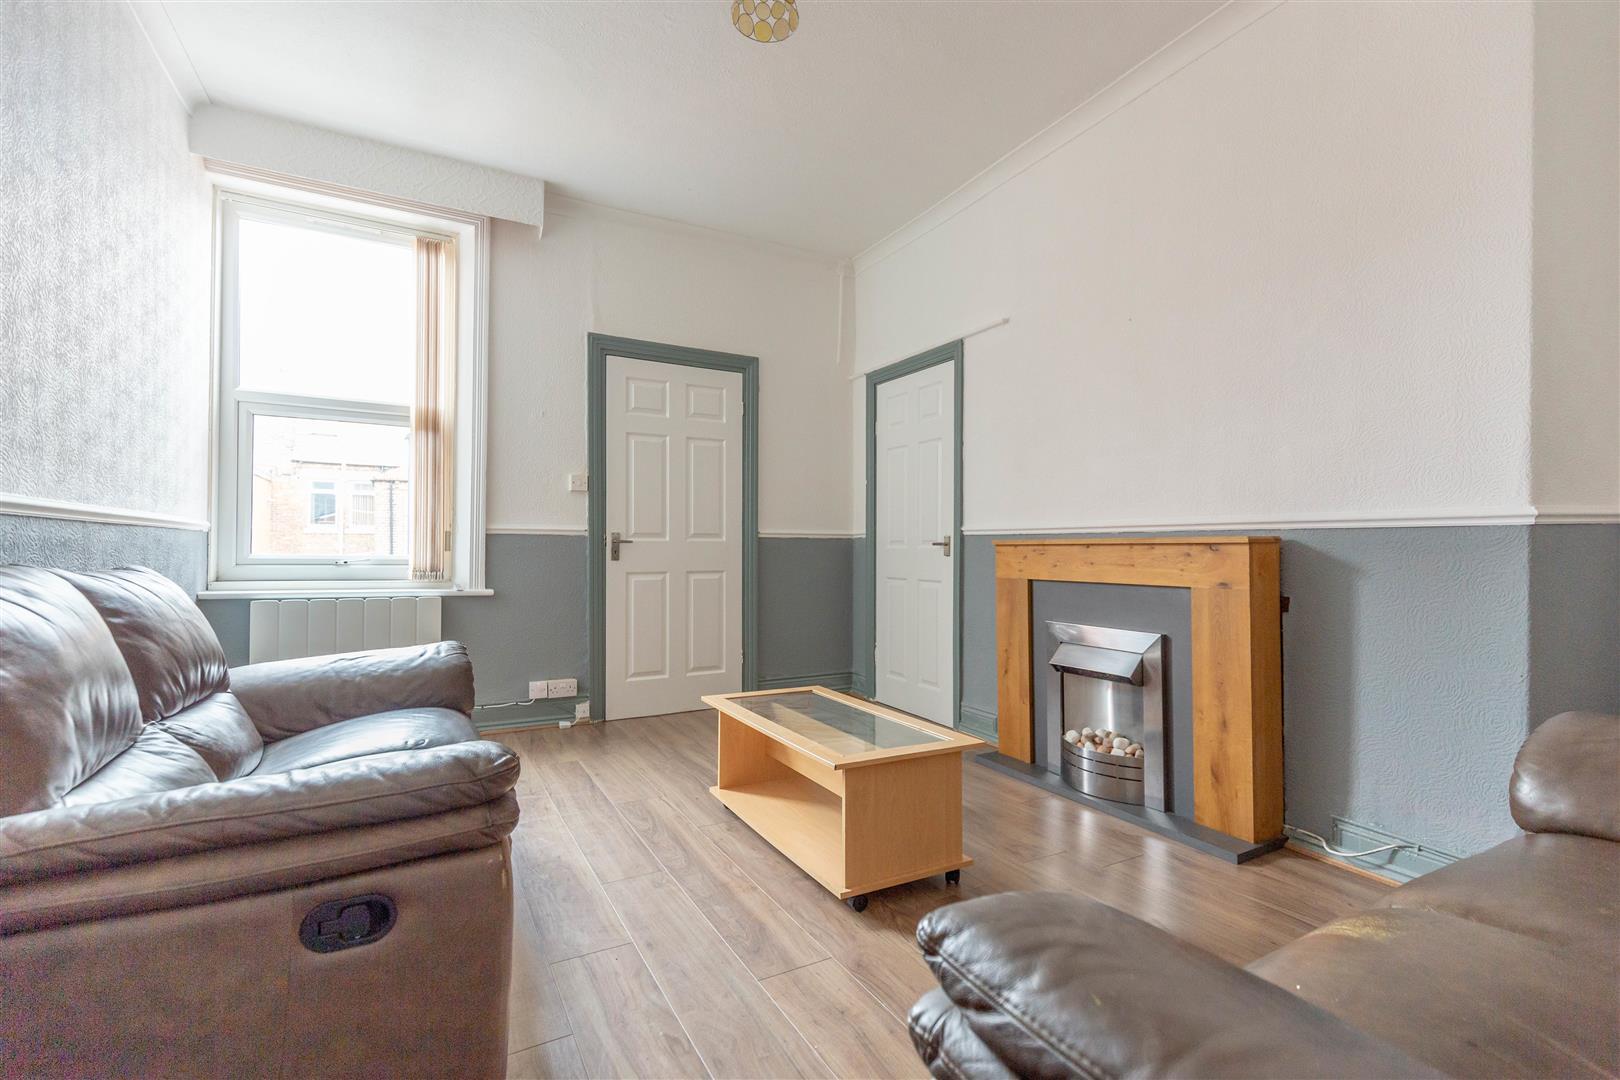 2 bed flat to rent in Newcastle Upon Tyne, NE6 5LF, NE6